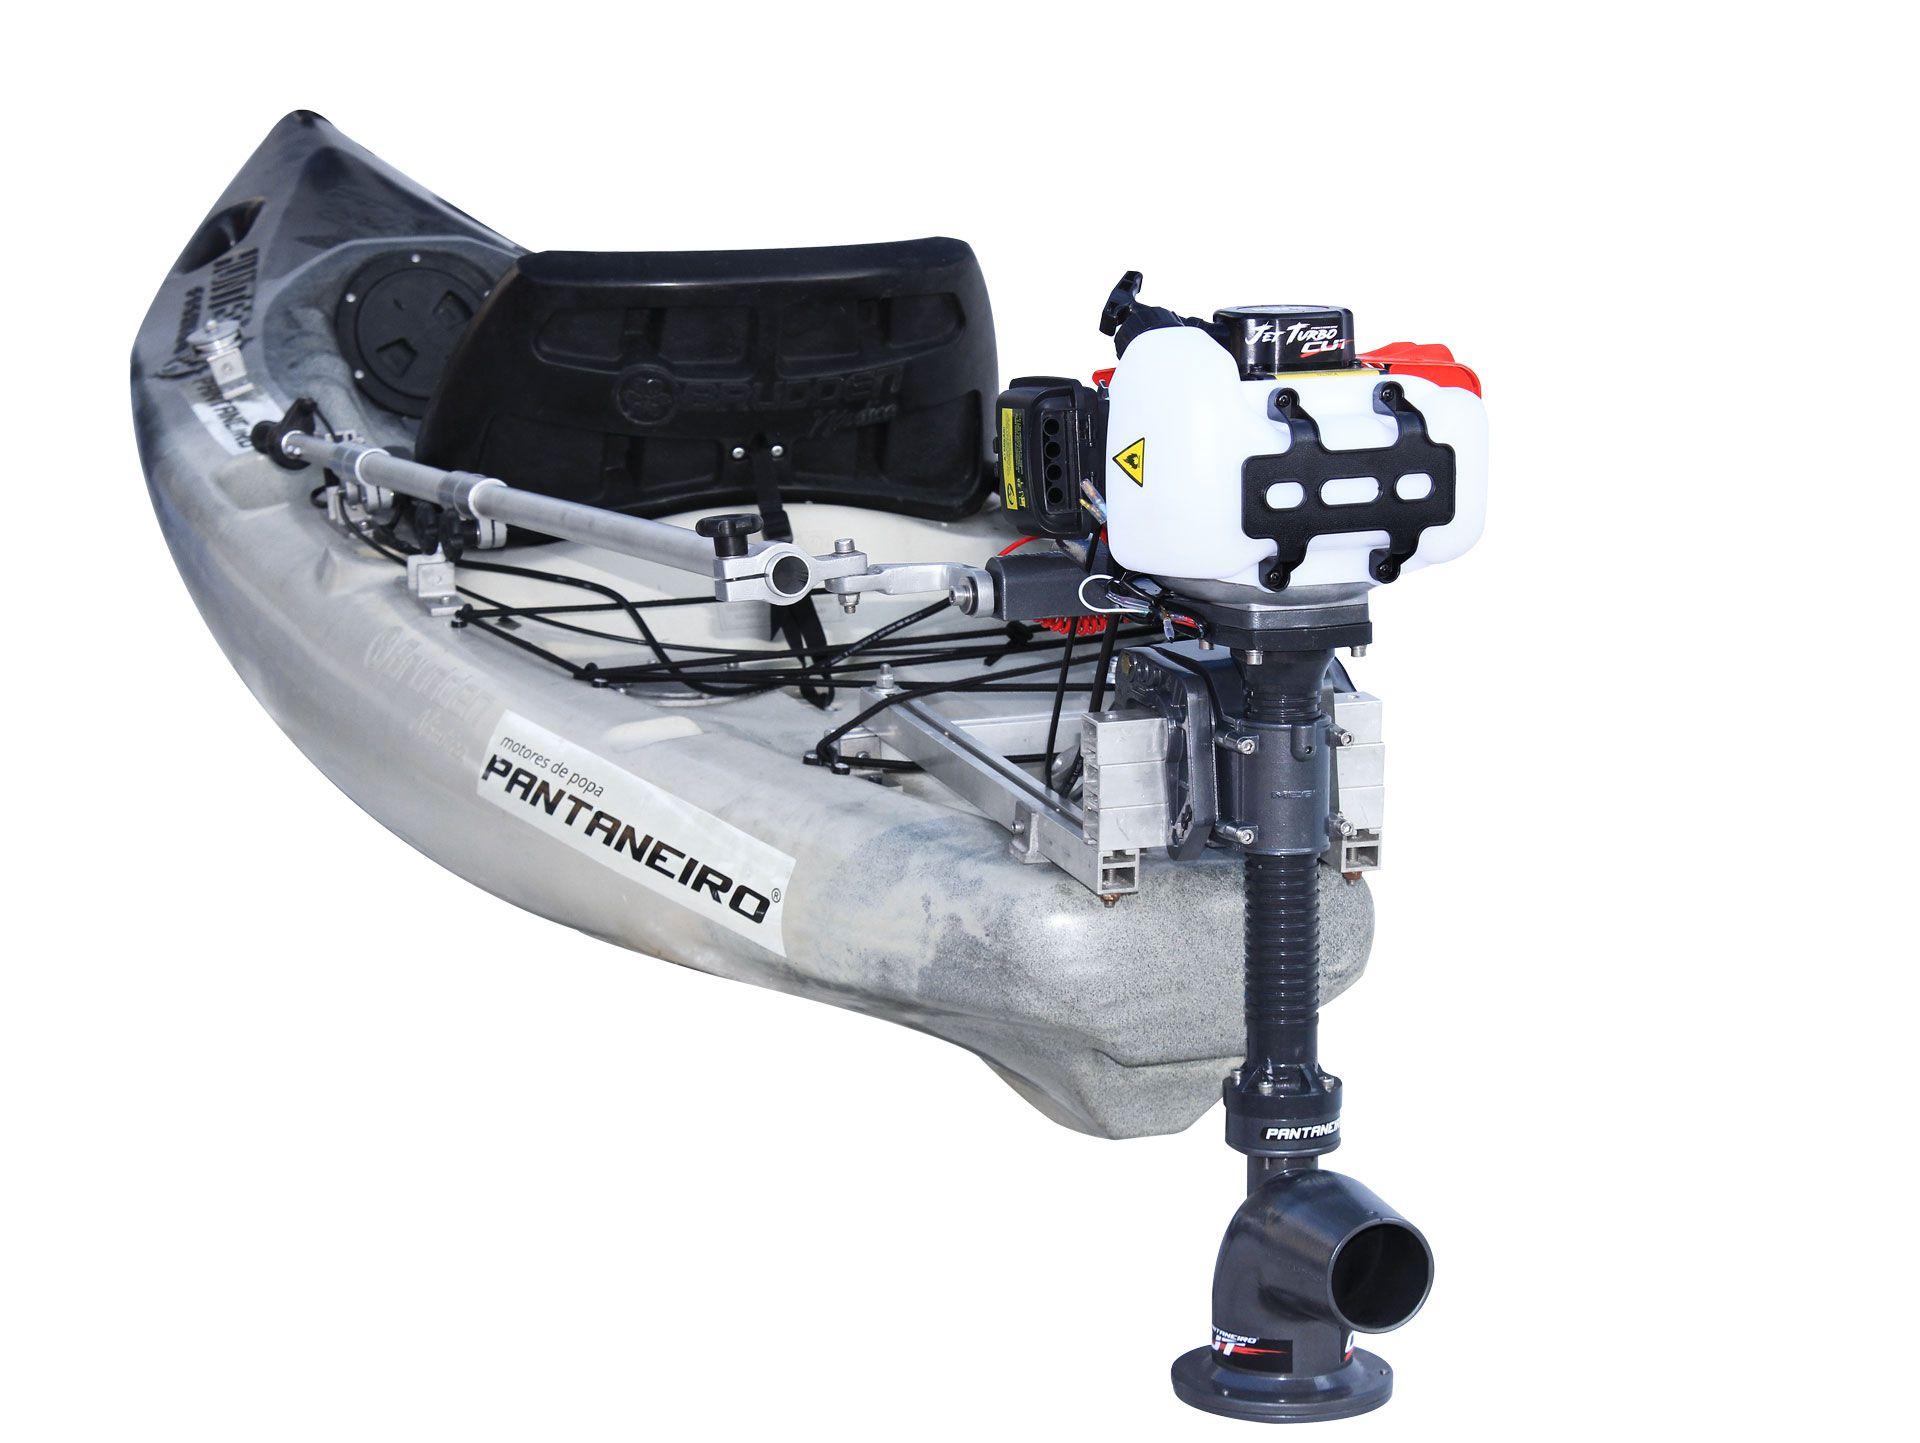 Kit Jet Turbo Cut Pantaneiro + acelerador remoto + Suporte traseiro Universal